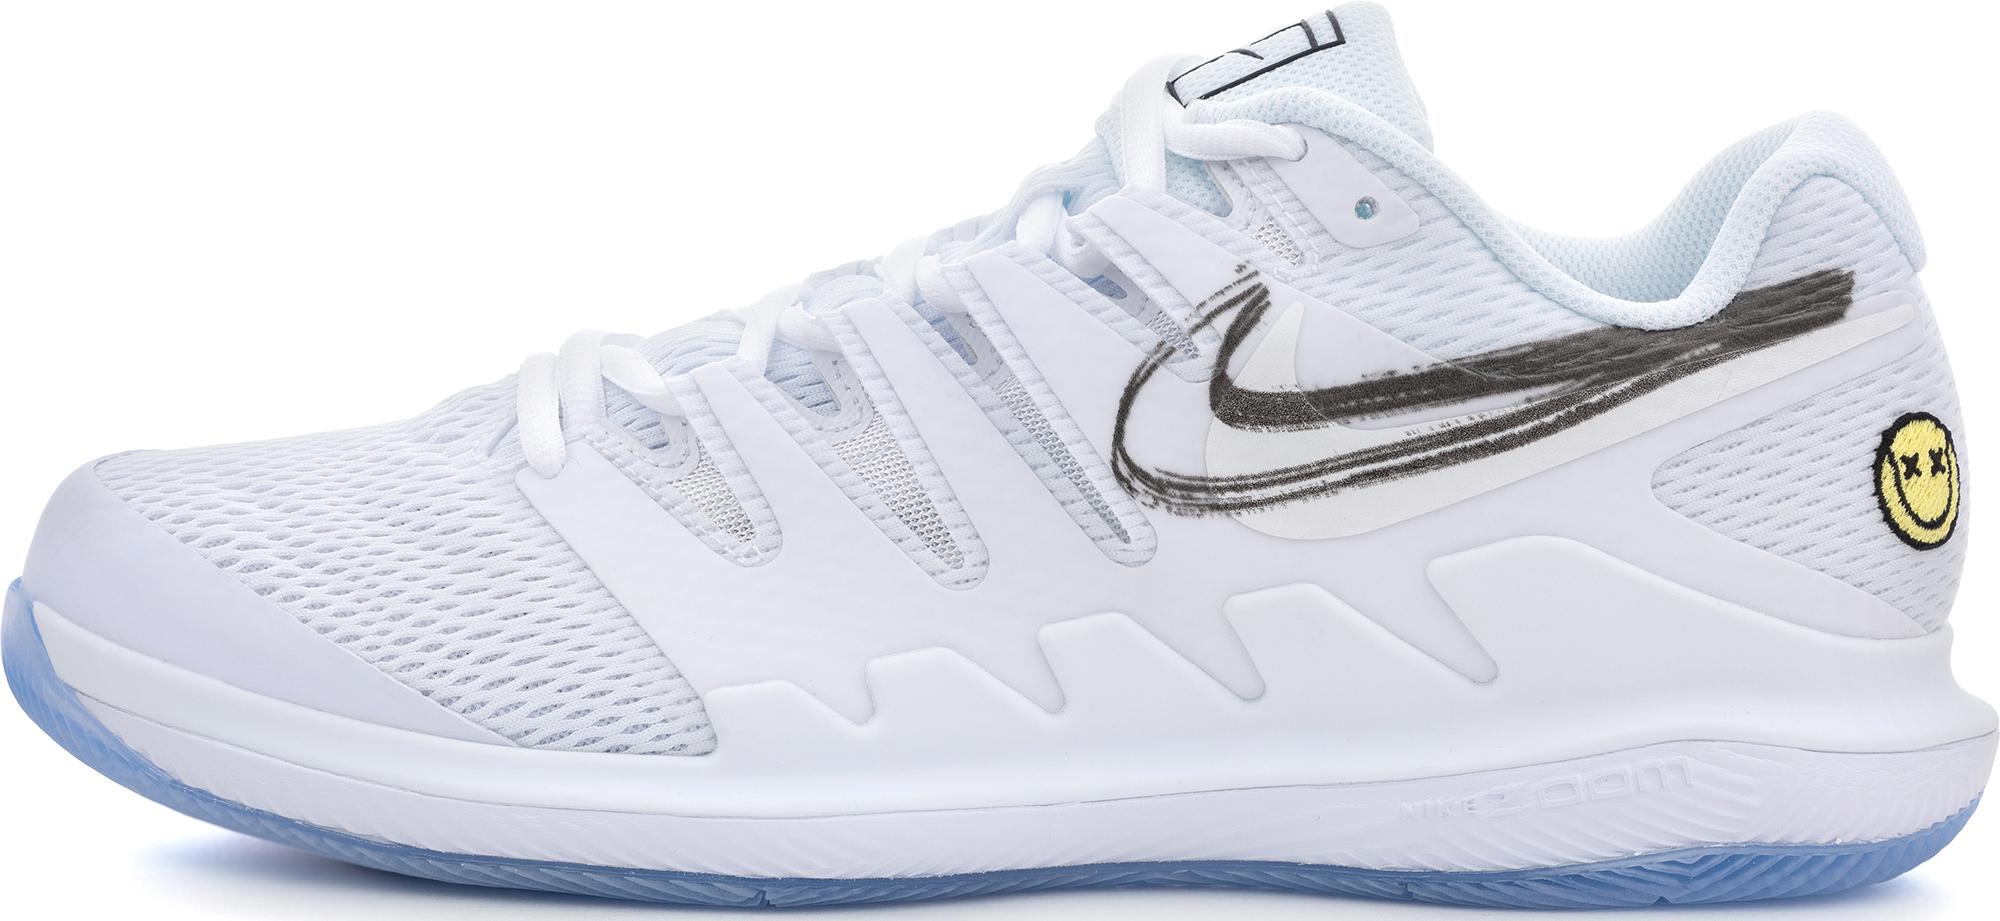 Nike Кроссовки мужские Nike Air Zoom Vapor X, размер 44 цена